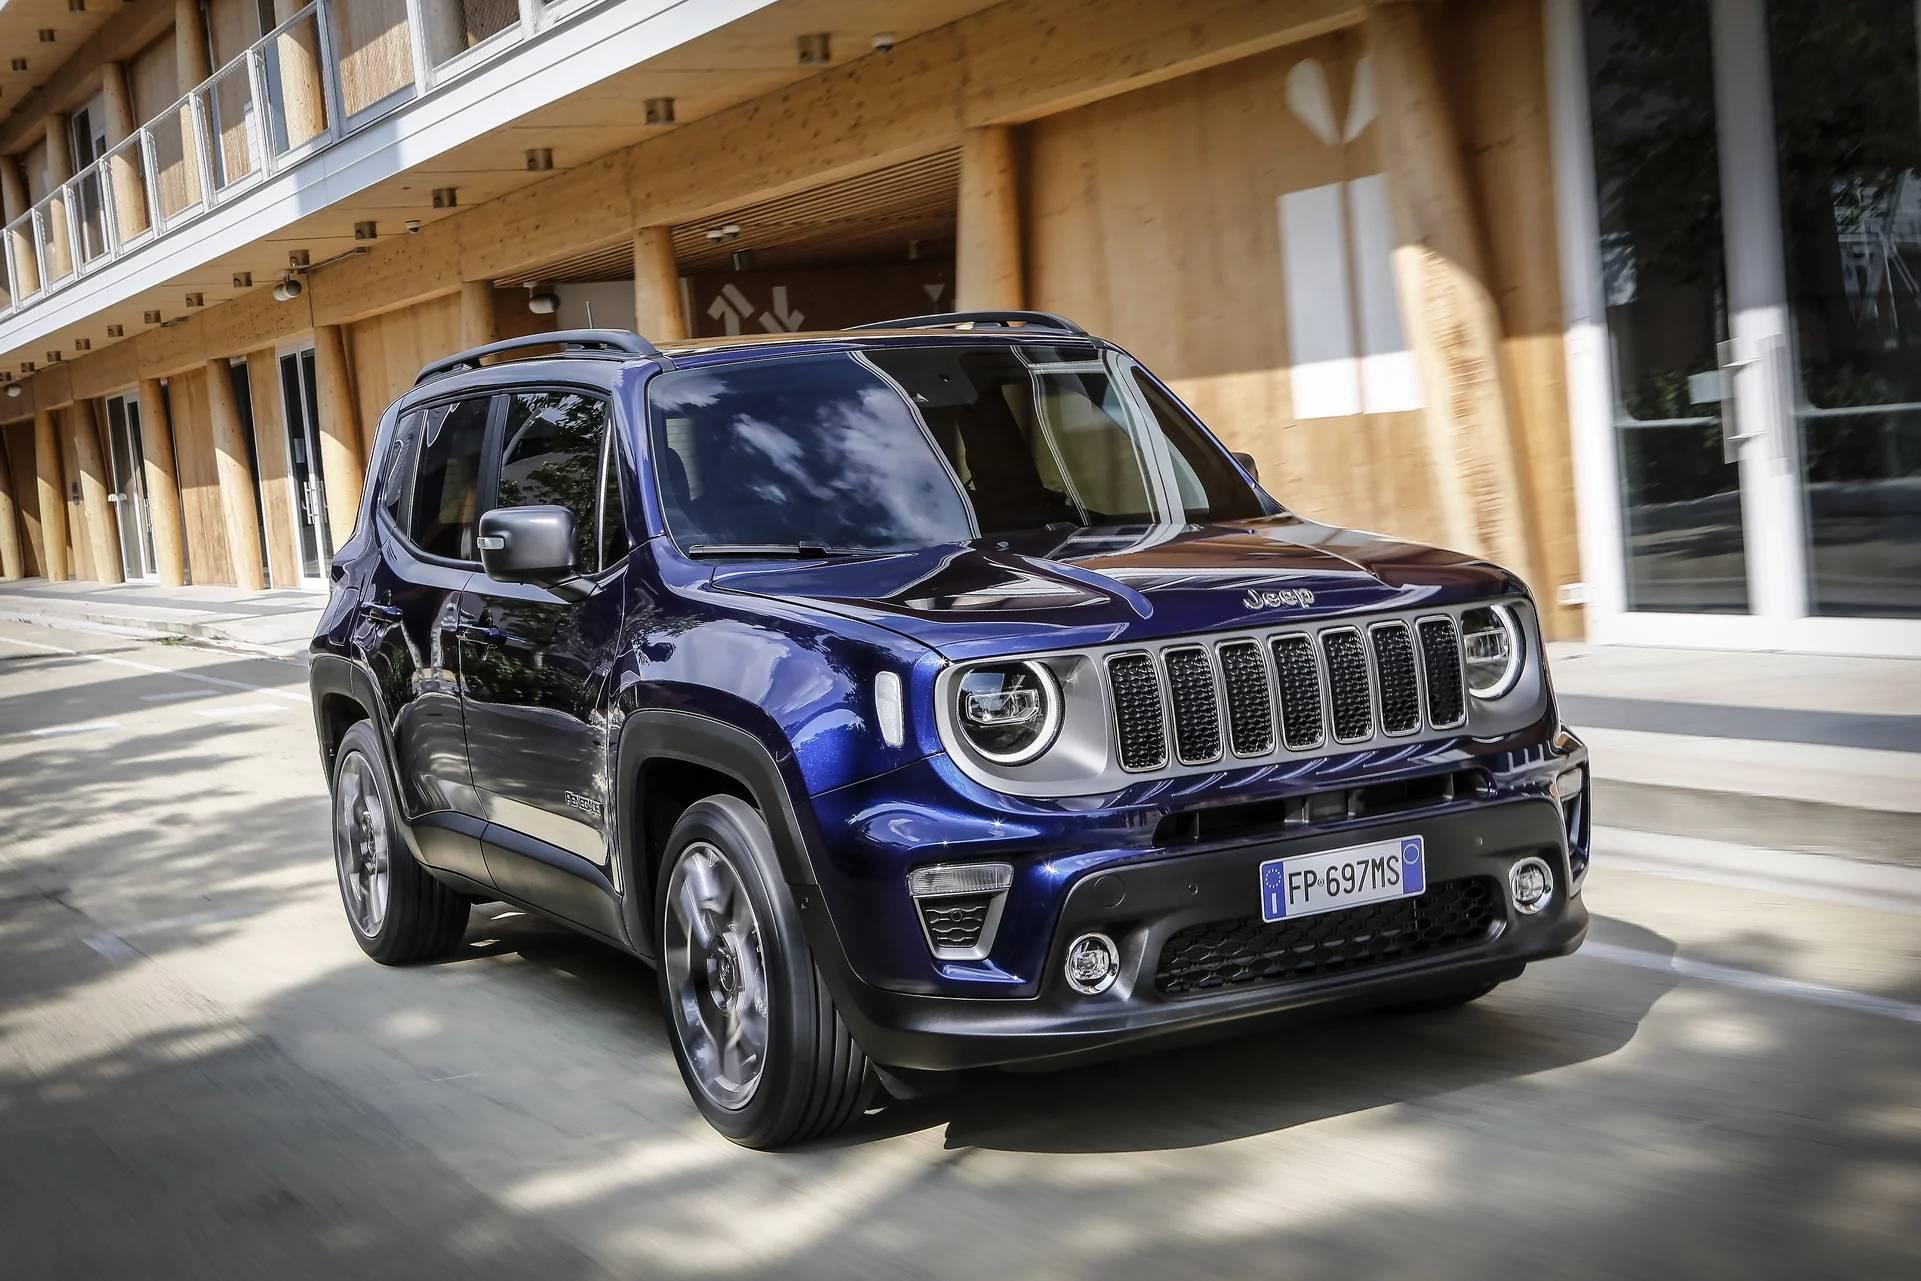 Jeep Renegade 2019 представили во всех подробностях